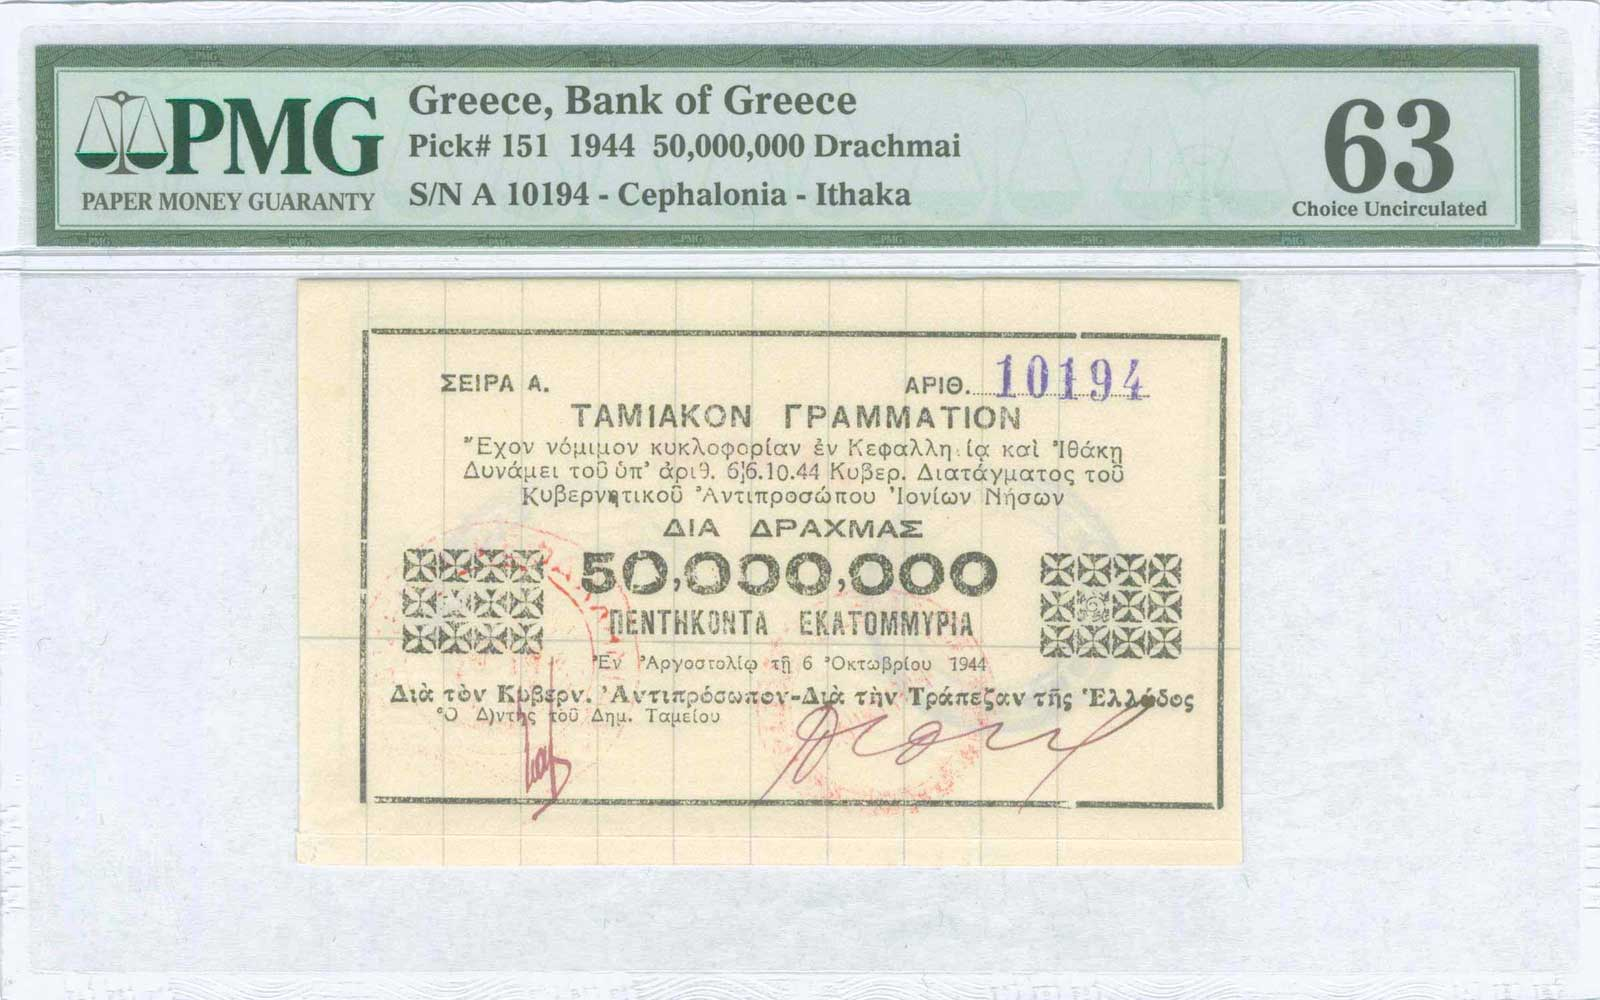 Lot 9387 - GREECE-  PAPER MONEY - BANKNOTES TREASURY BONDS & FISCAL NOTES -  A. Karamitsos Public & LIVE Bid Auction 610 Coins, Medals & Banknotes